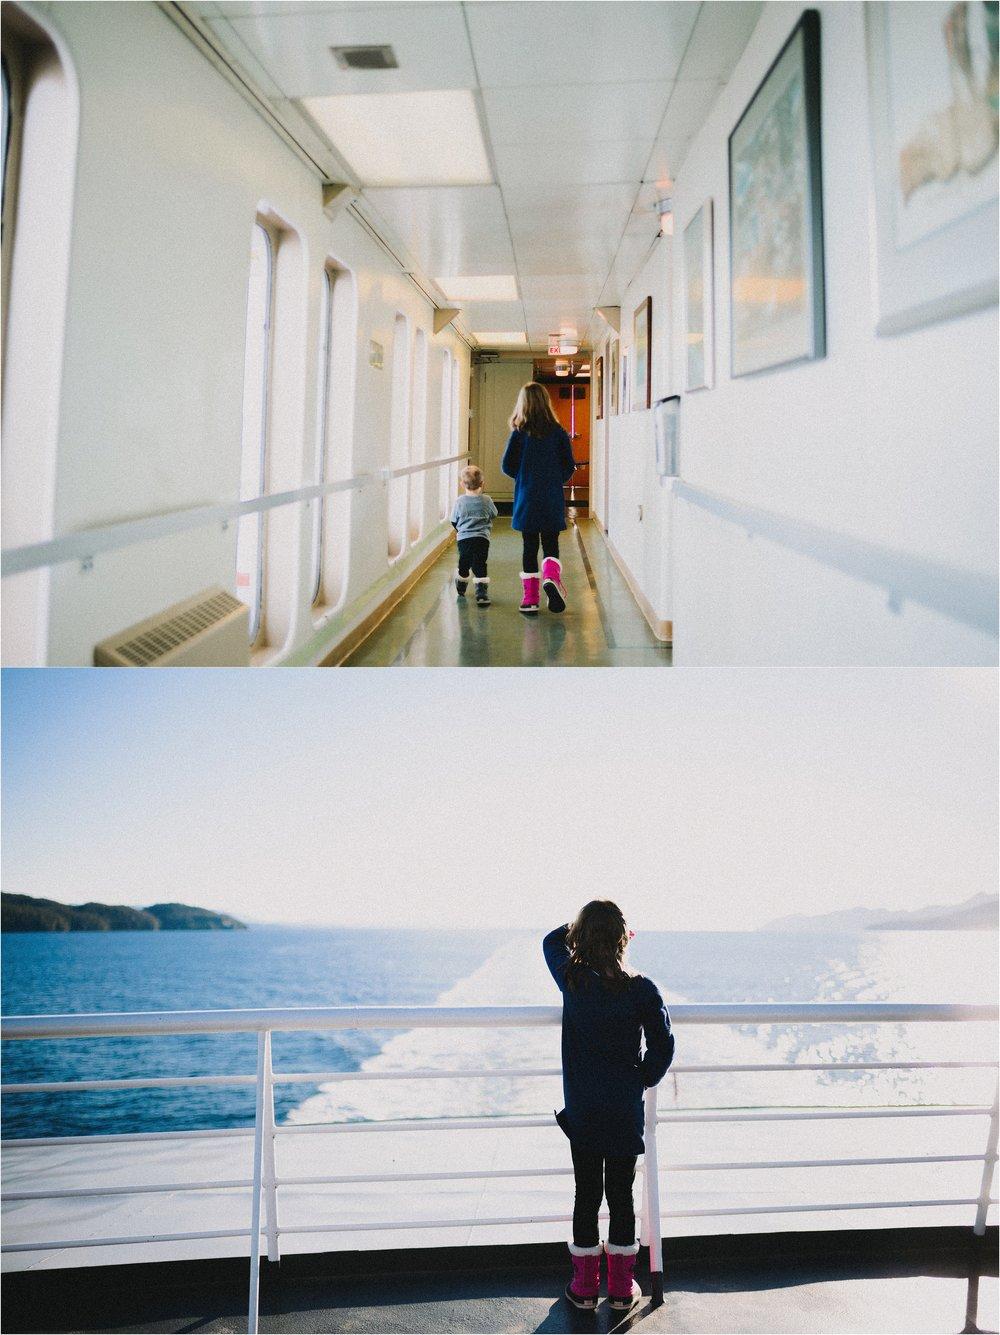 jannicka-mayte-anchorage-alaska-lifestyle-photographer_0008.jpg